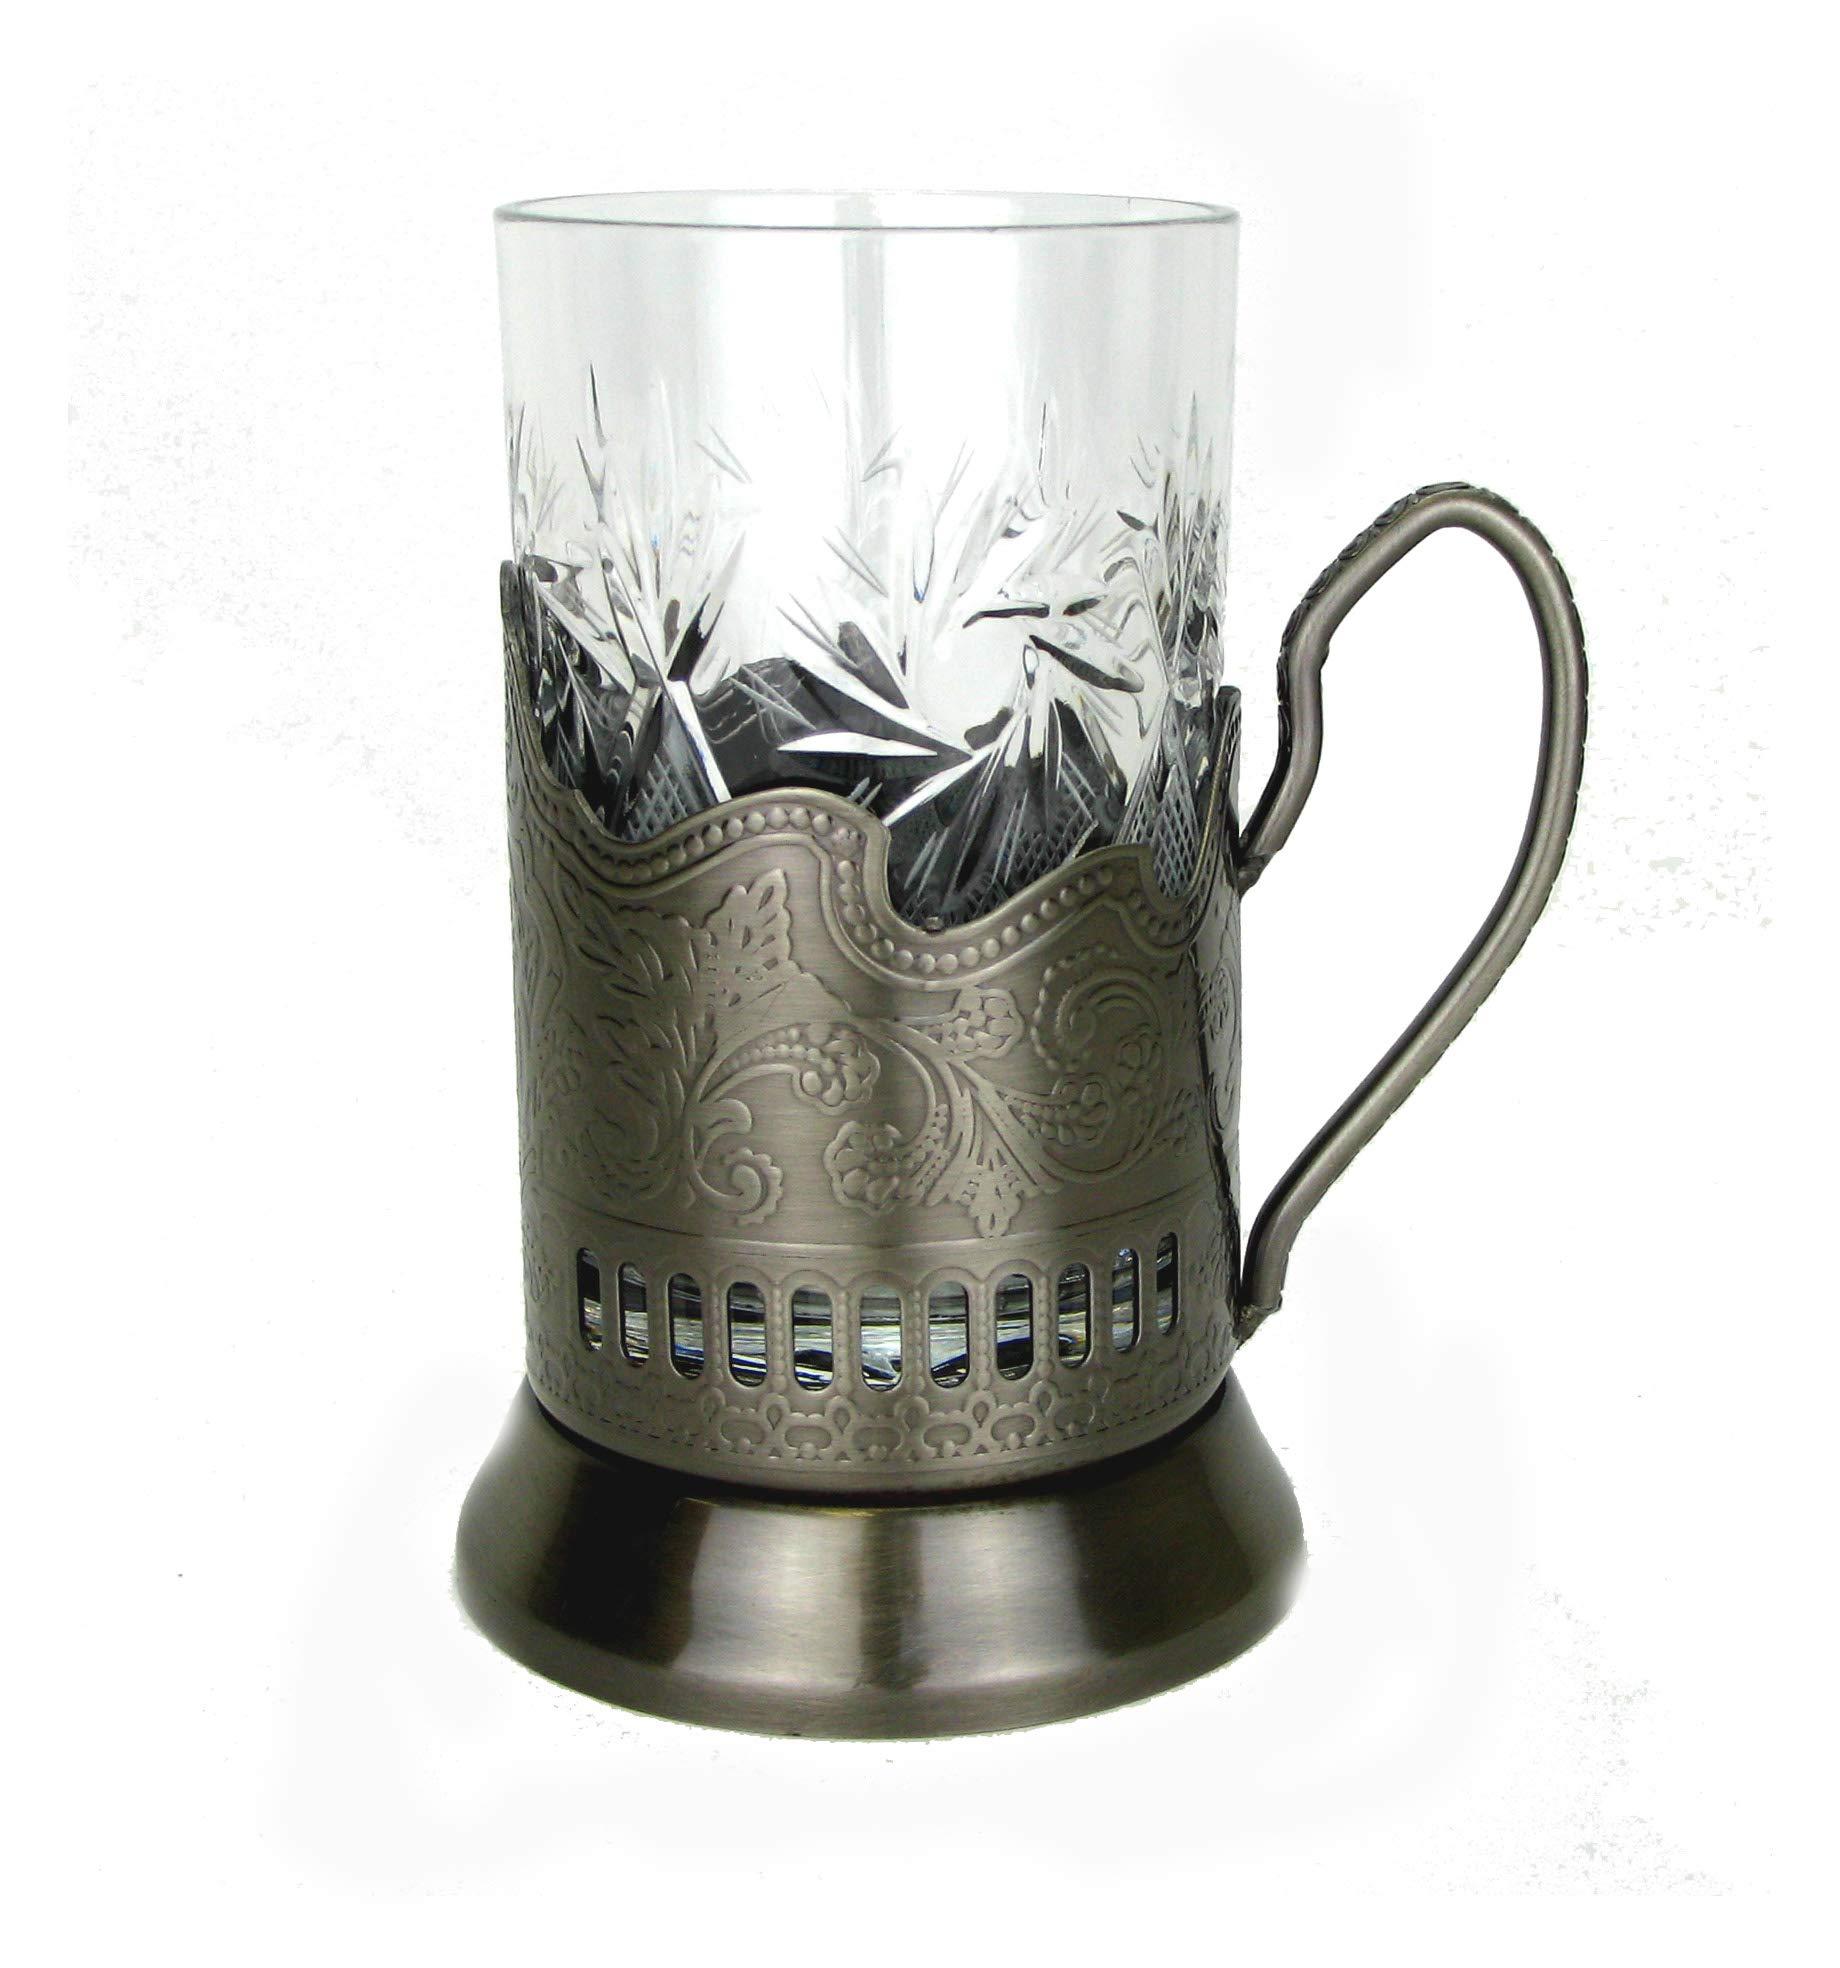 1 Russian Crystal Hot Tea Glass 8.5 Oz & 1 Metal Glass Holder Podstakannik